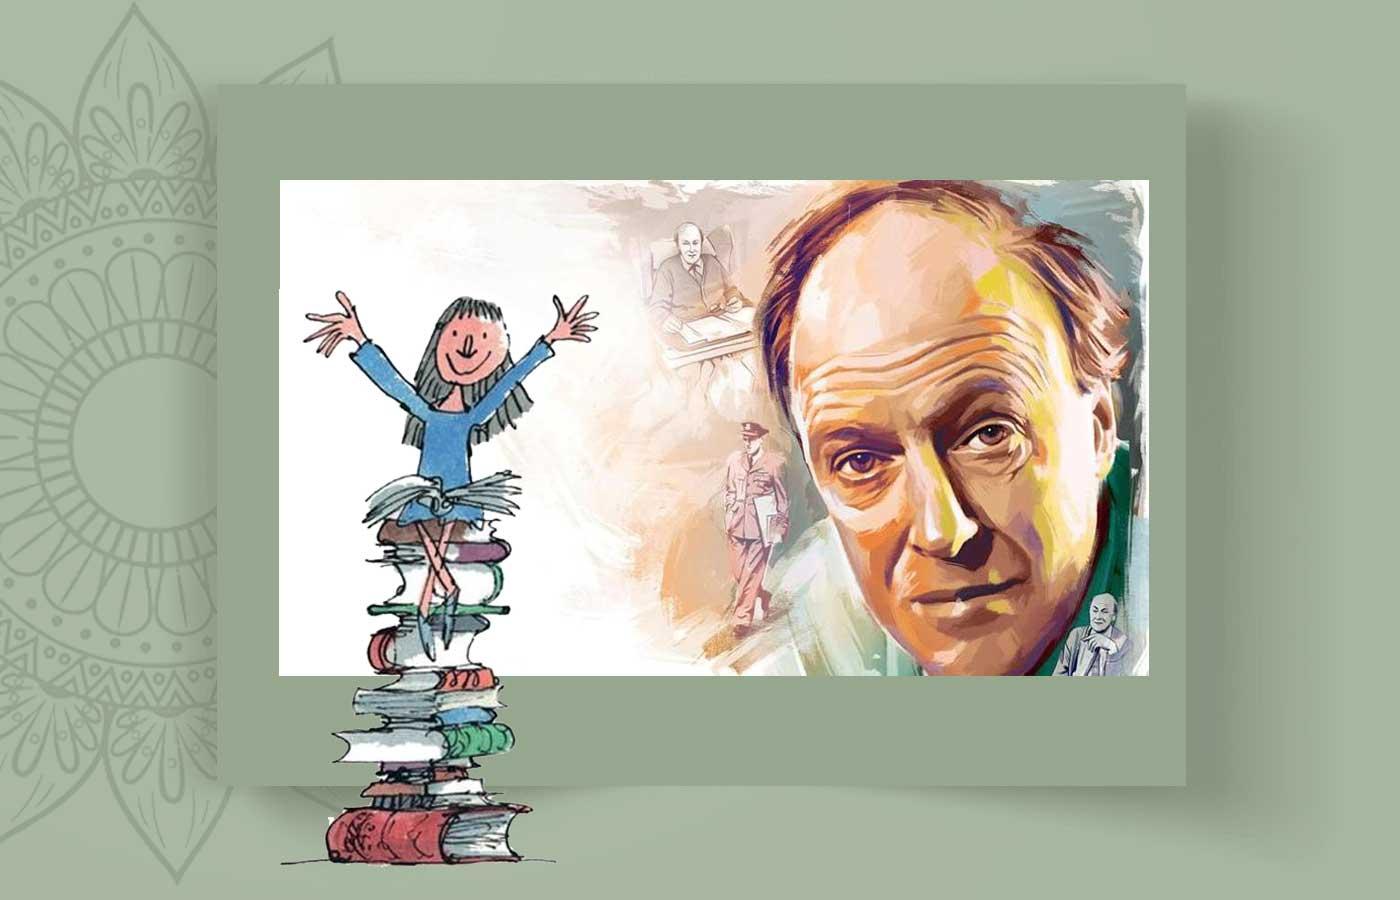 Roald Dah 5l - رولد دال و غول ادبیات کودکان ، Roald Dahl